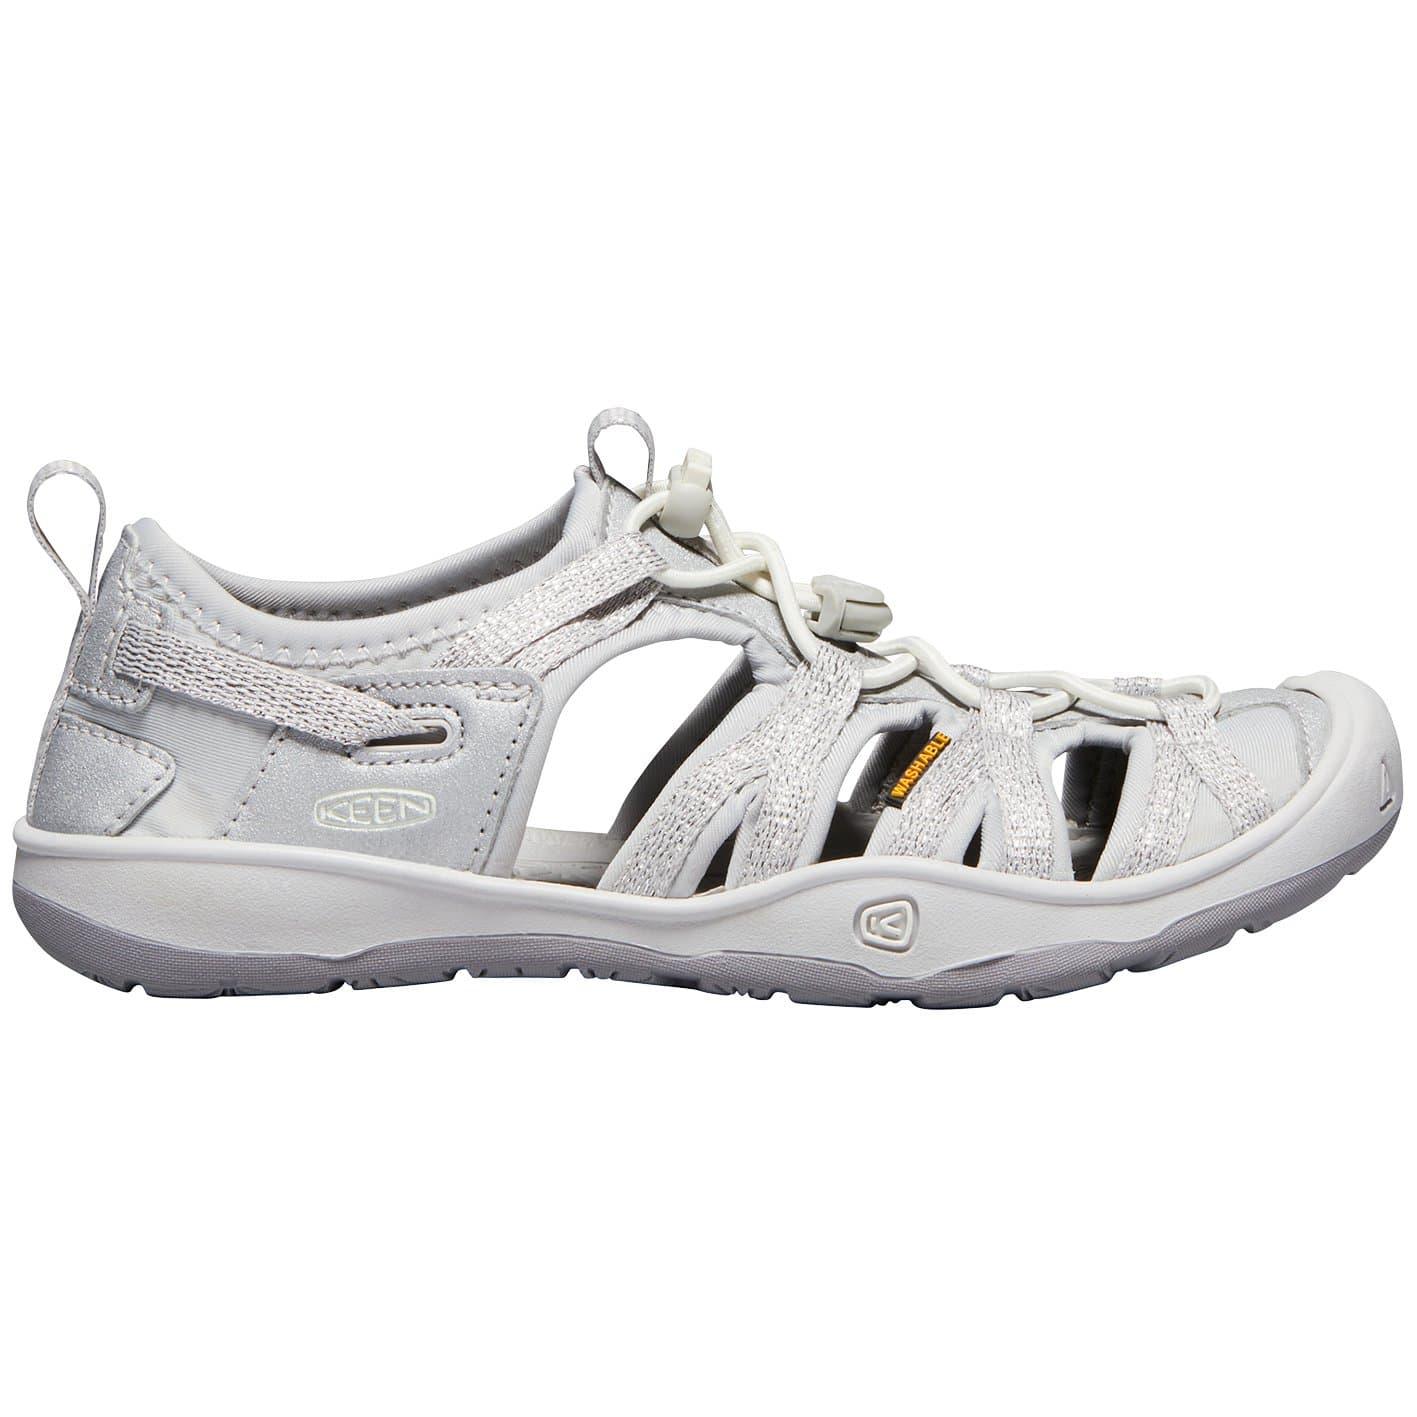 Keen Moxie Sandal Kinder-Sandale